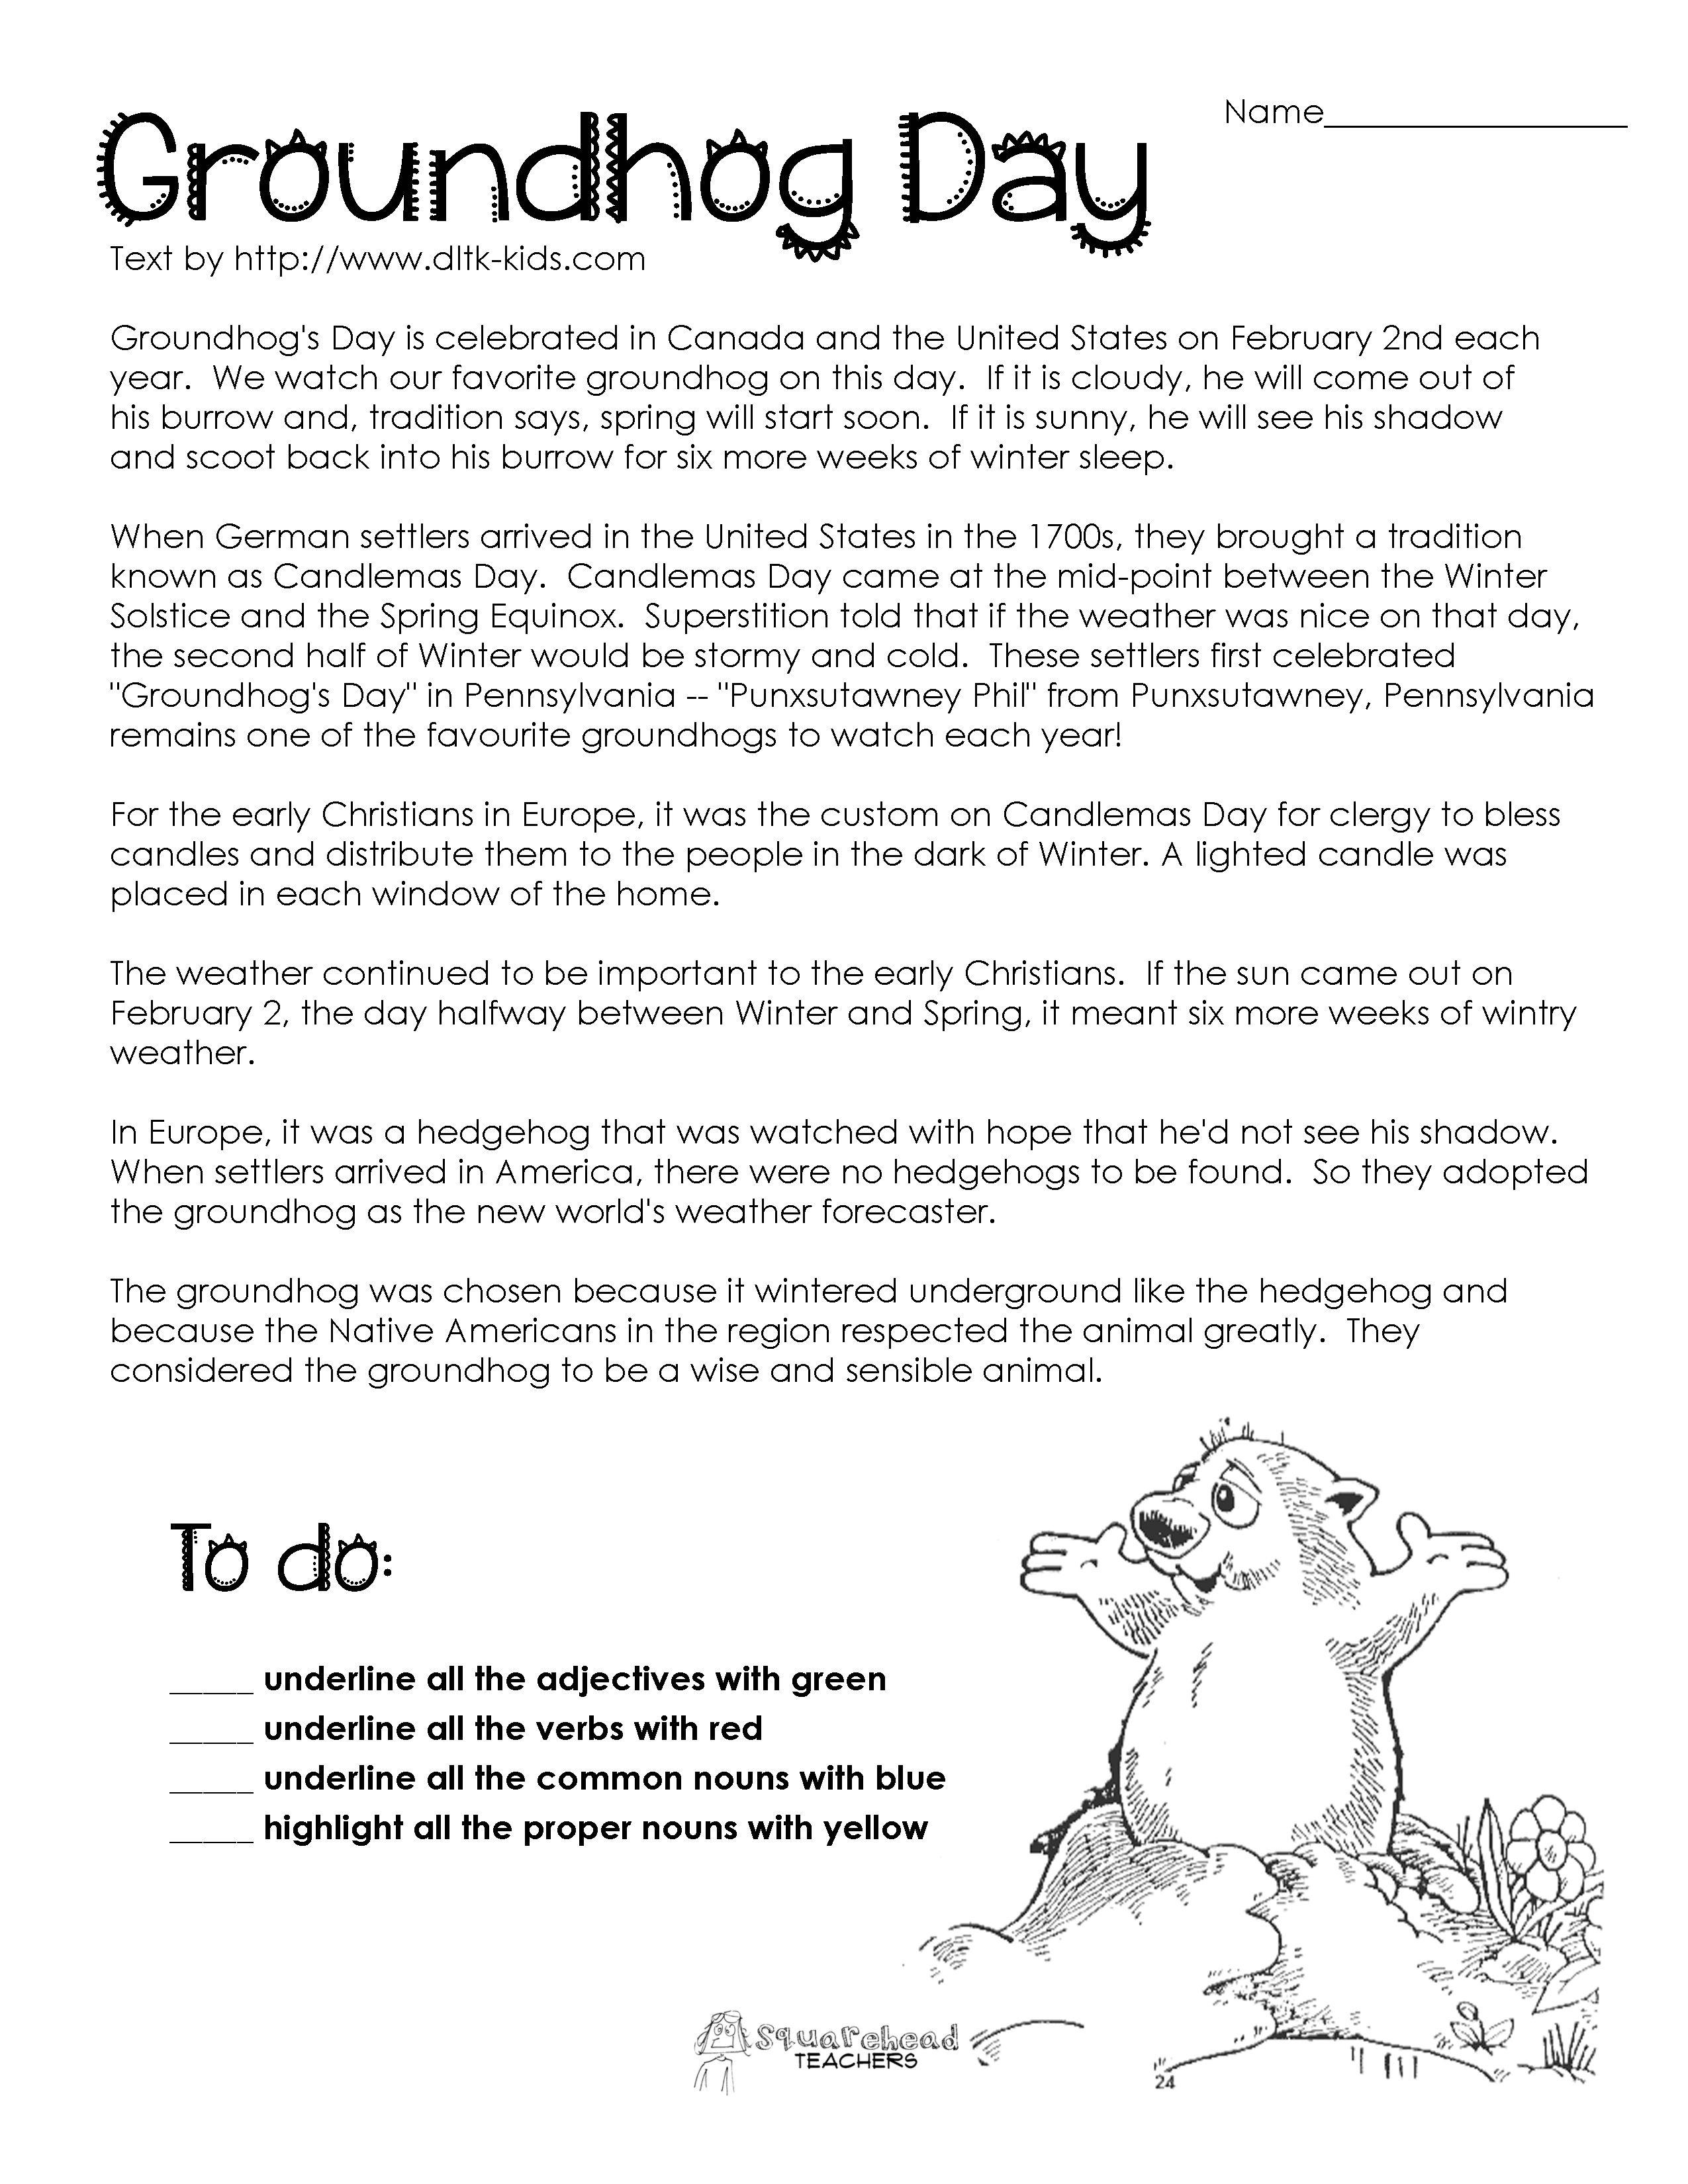 Groundhog Day Comprehension Worksheets - Google Search | Ground Hog | Free Printable Worksheets For Groundhog Day